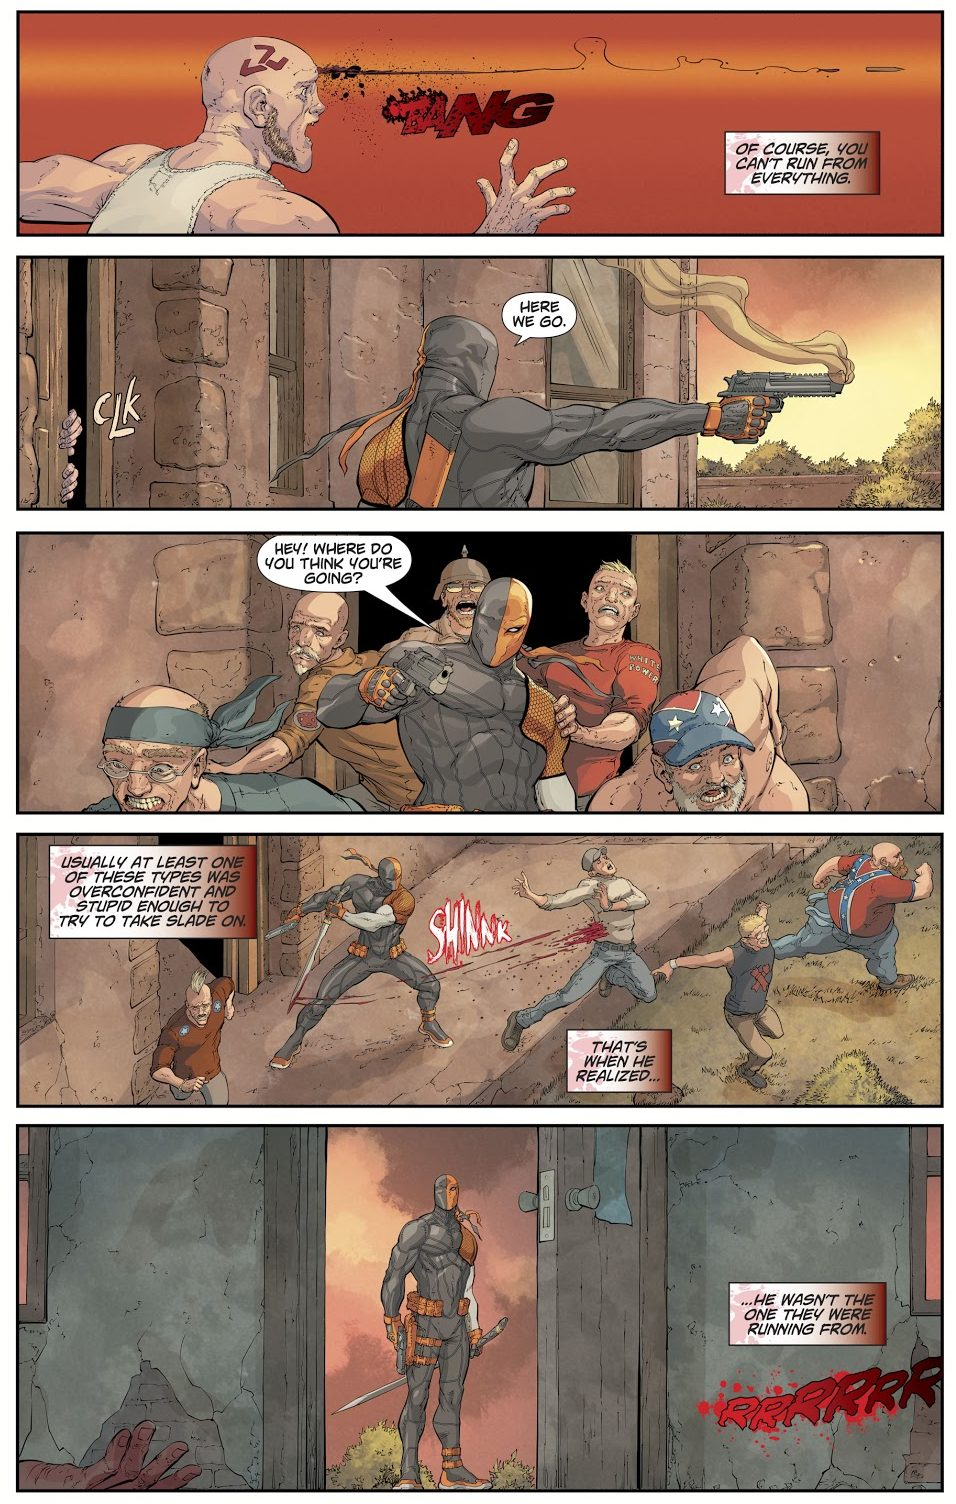 Deathstroke VS Zombie Nazis (DCeased: The Unkillables)